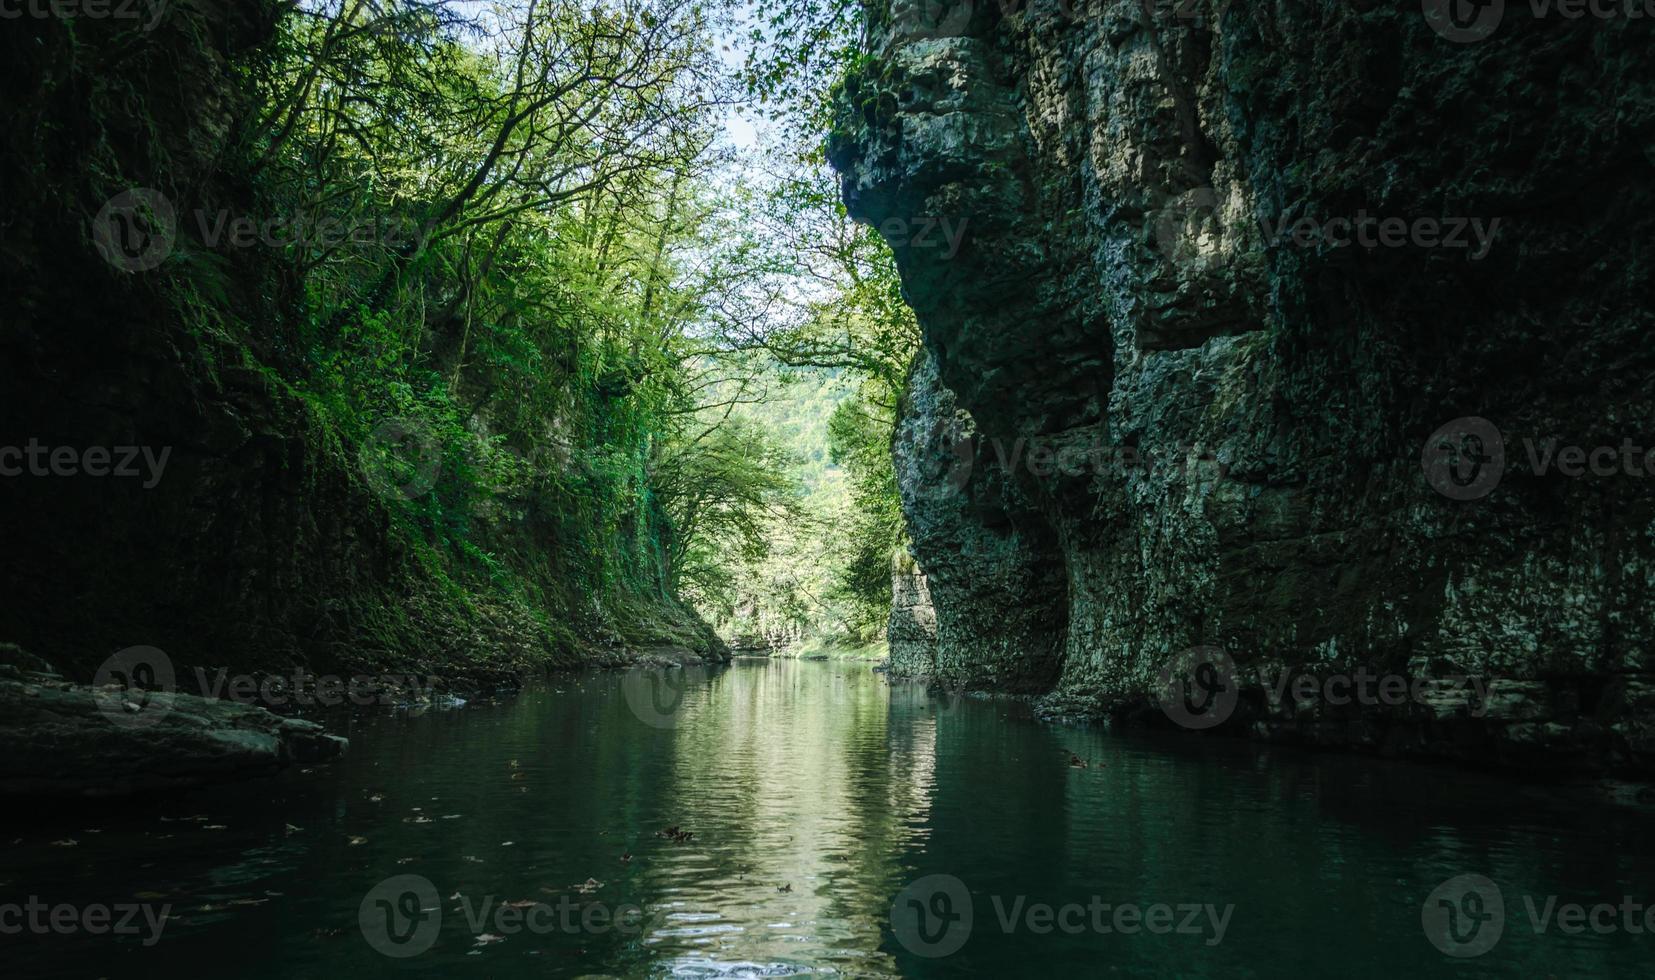 stroom in een donker bos foto